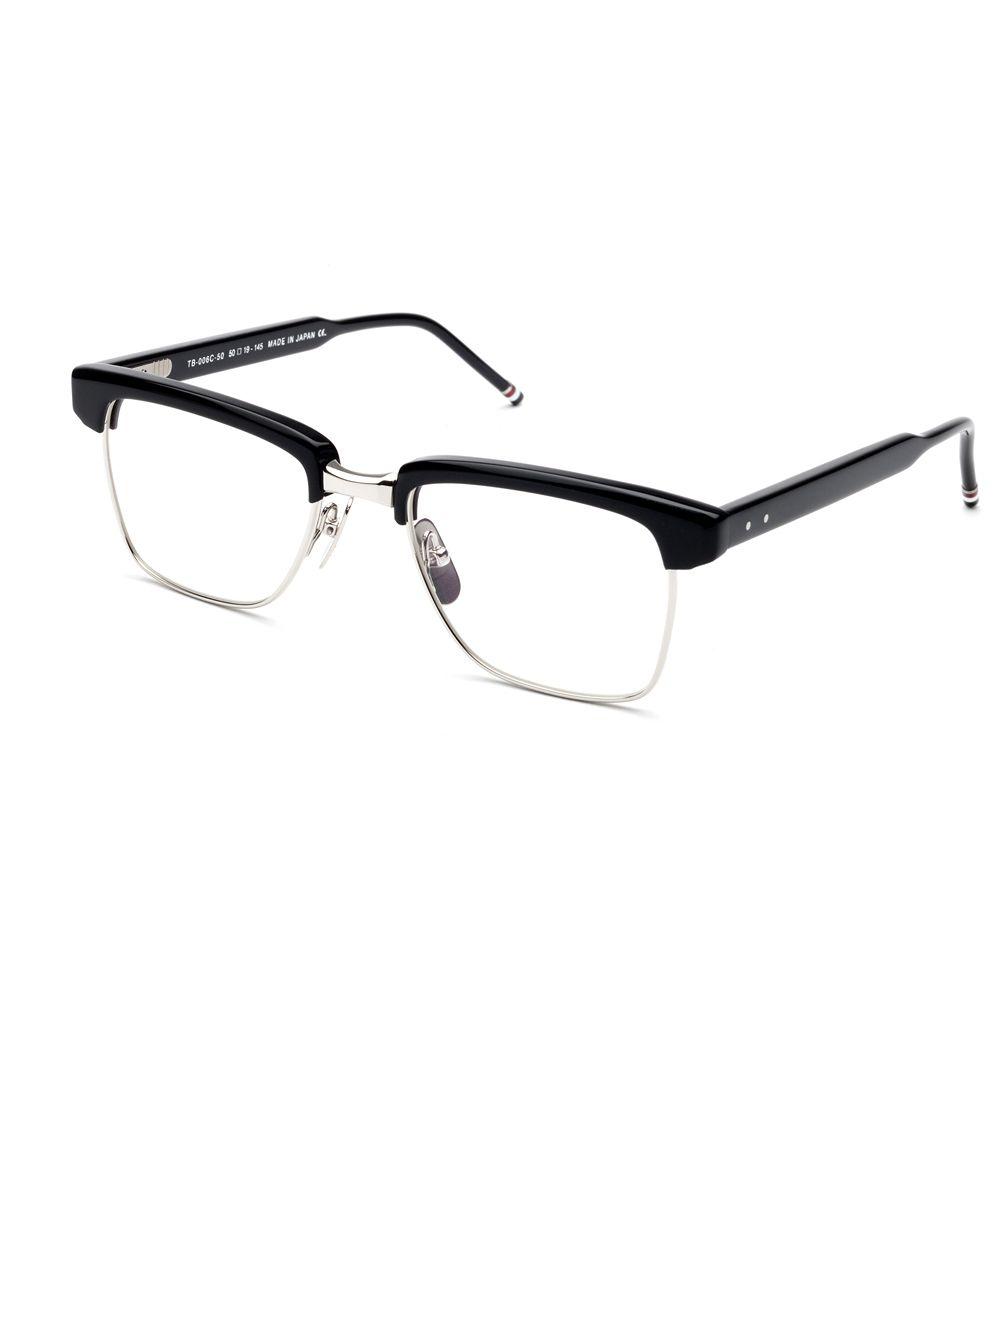 Thom Browne : Thom Browne Optical Glasses - TB-006C-50 | Men\'s Style ...